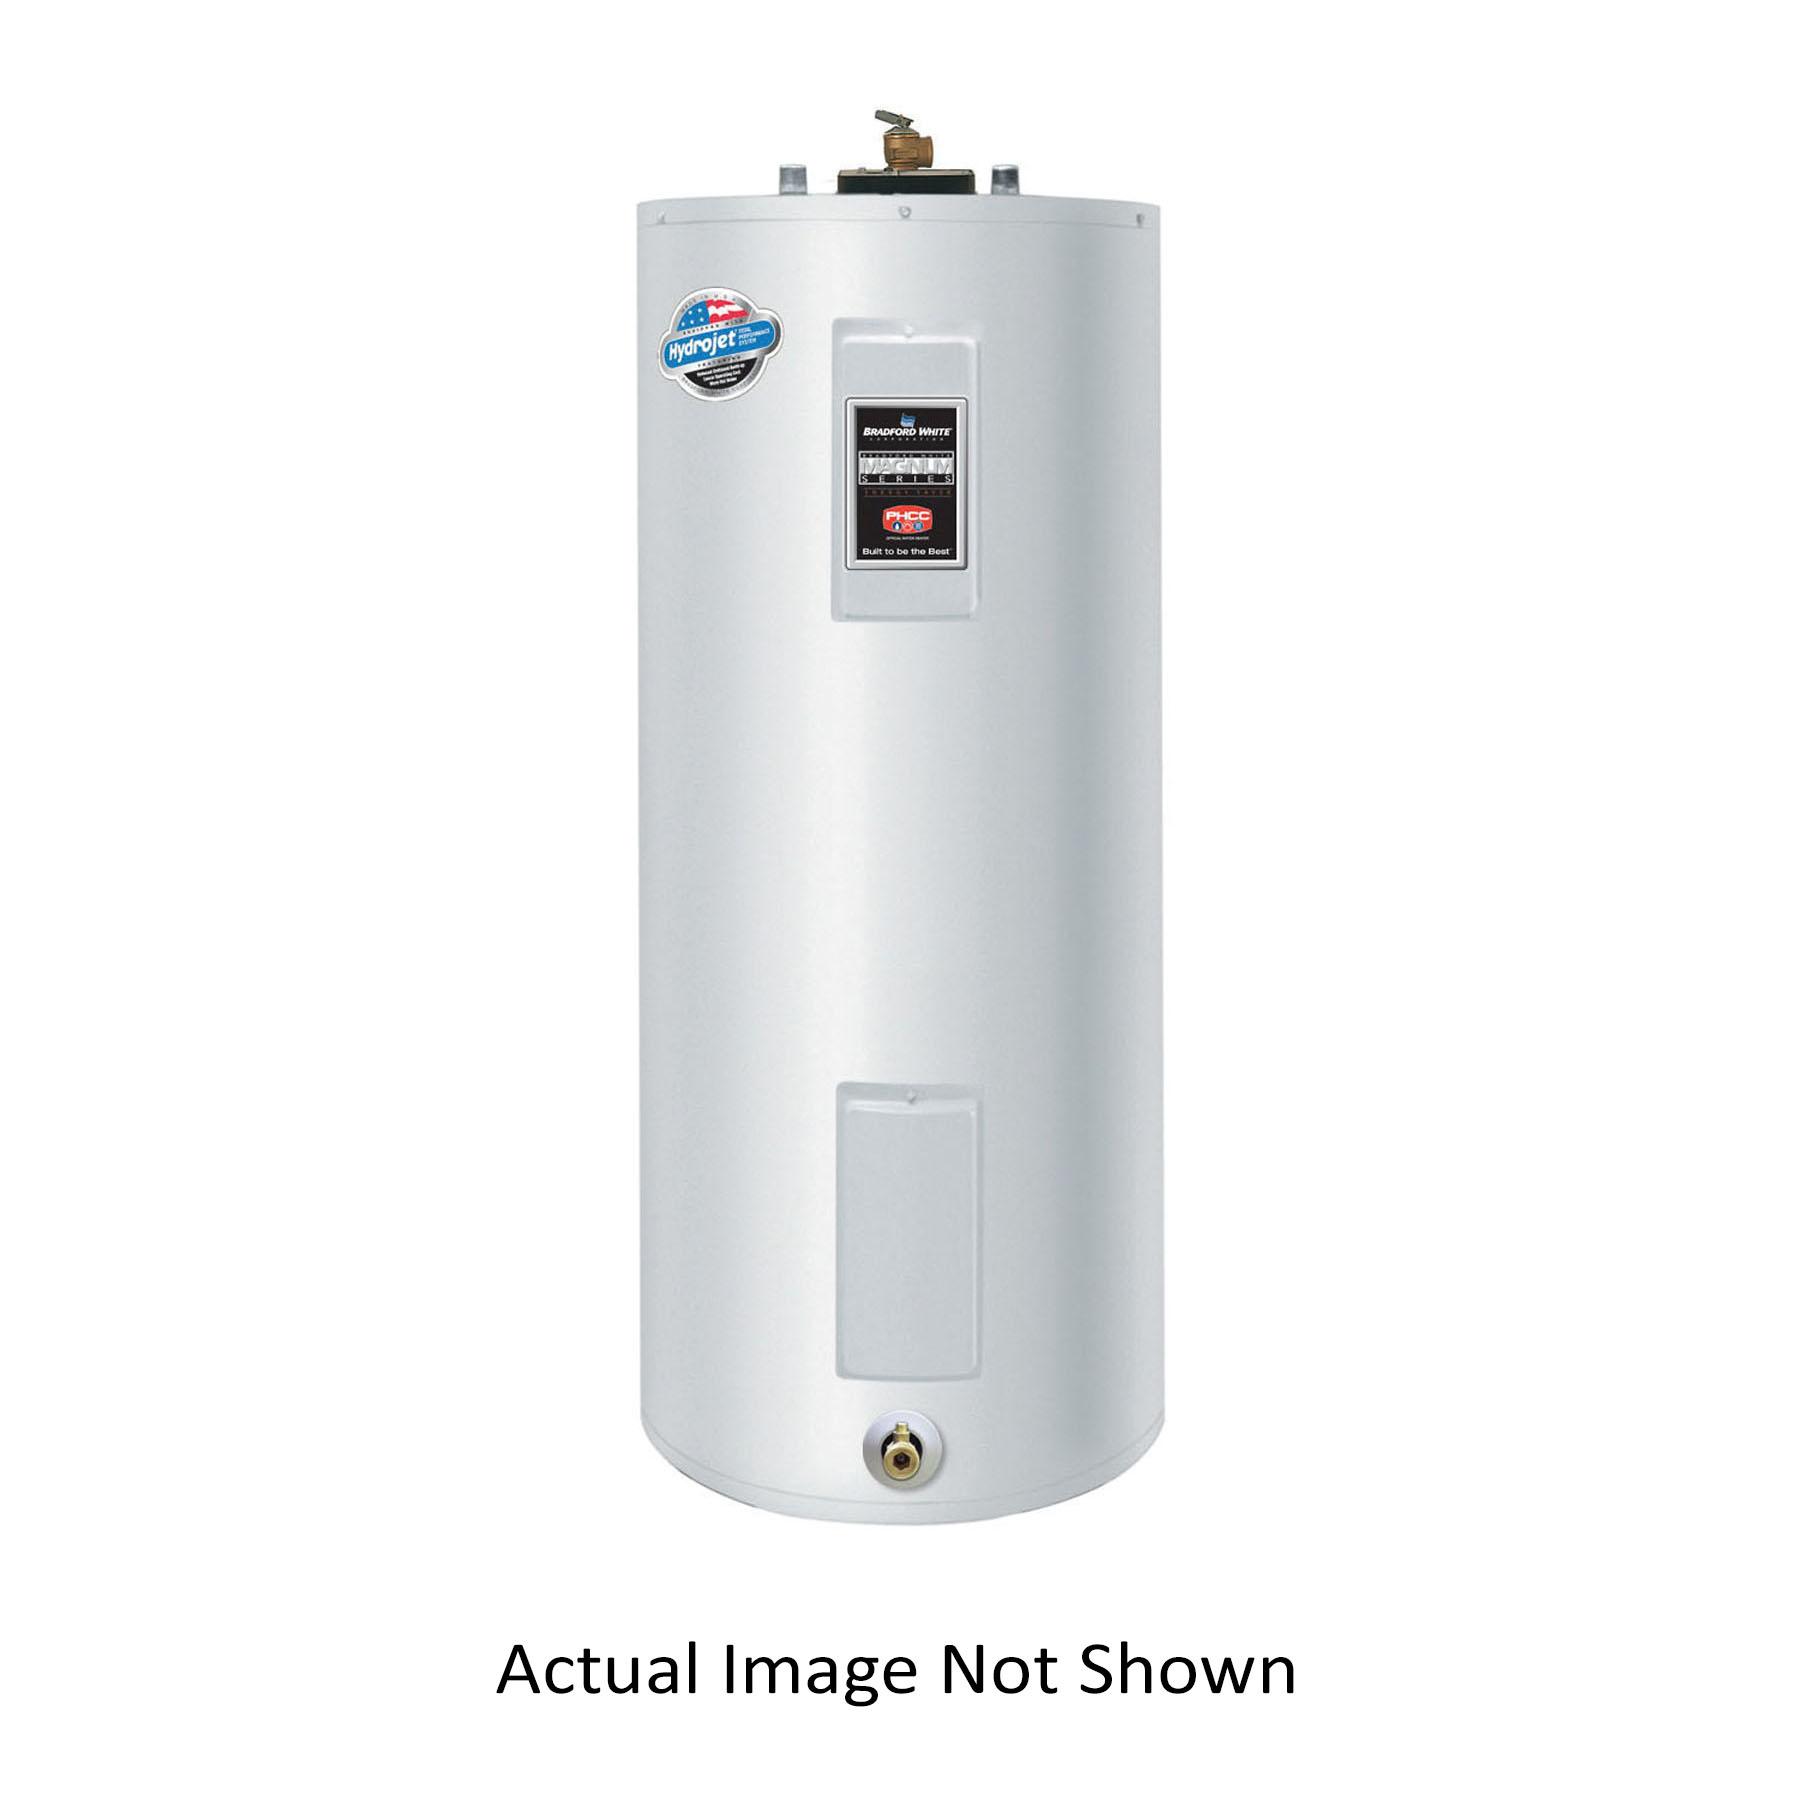 Bradford White® ElectriFLEX LD™ LE280T3-3 Light Duty Upright Lowboy Electric Water Heater, 80 gal Tank, 208/240 V